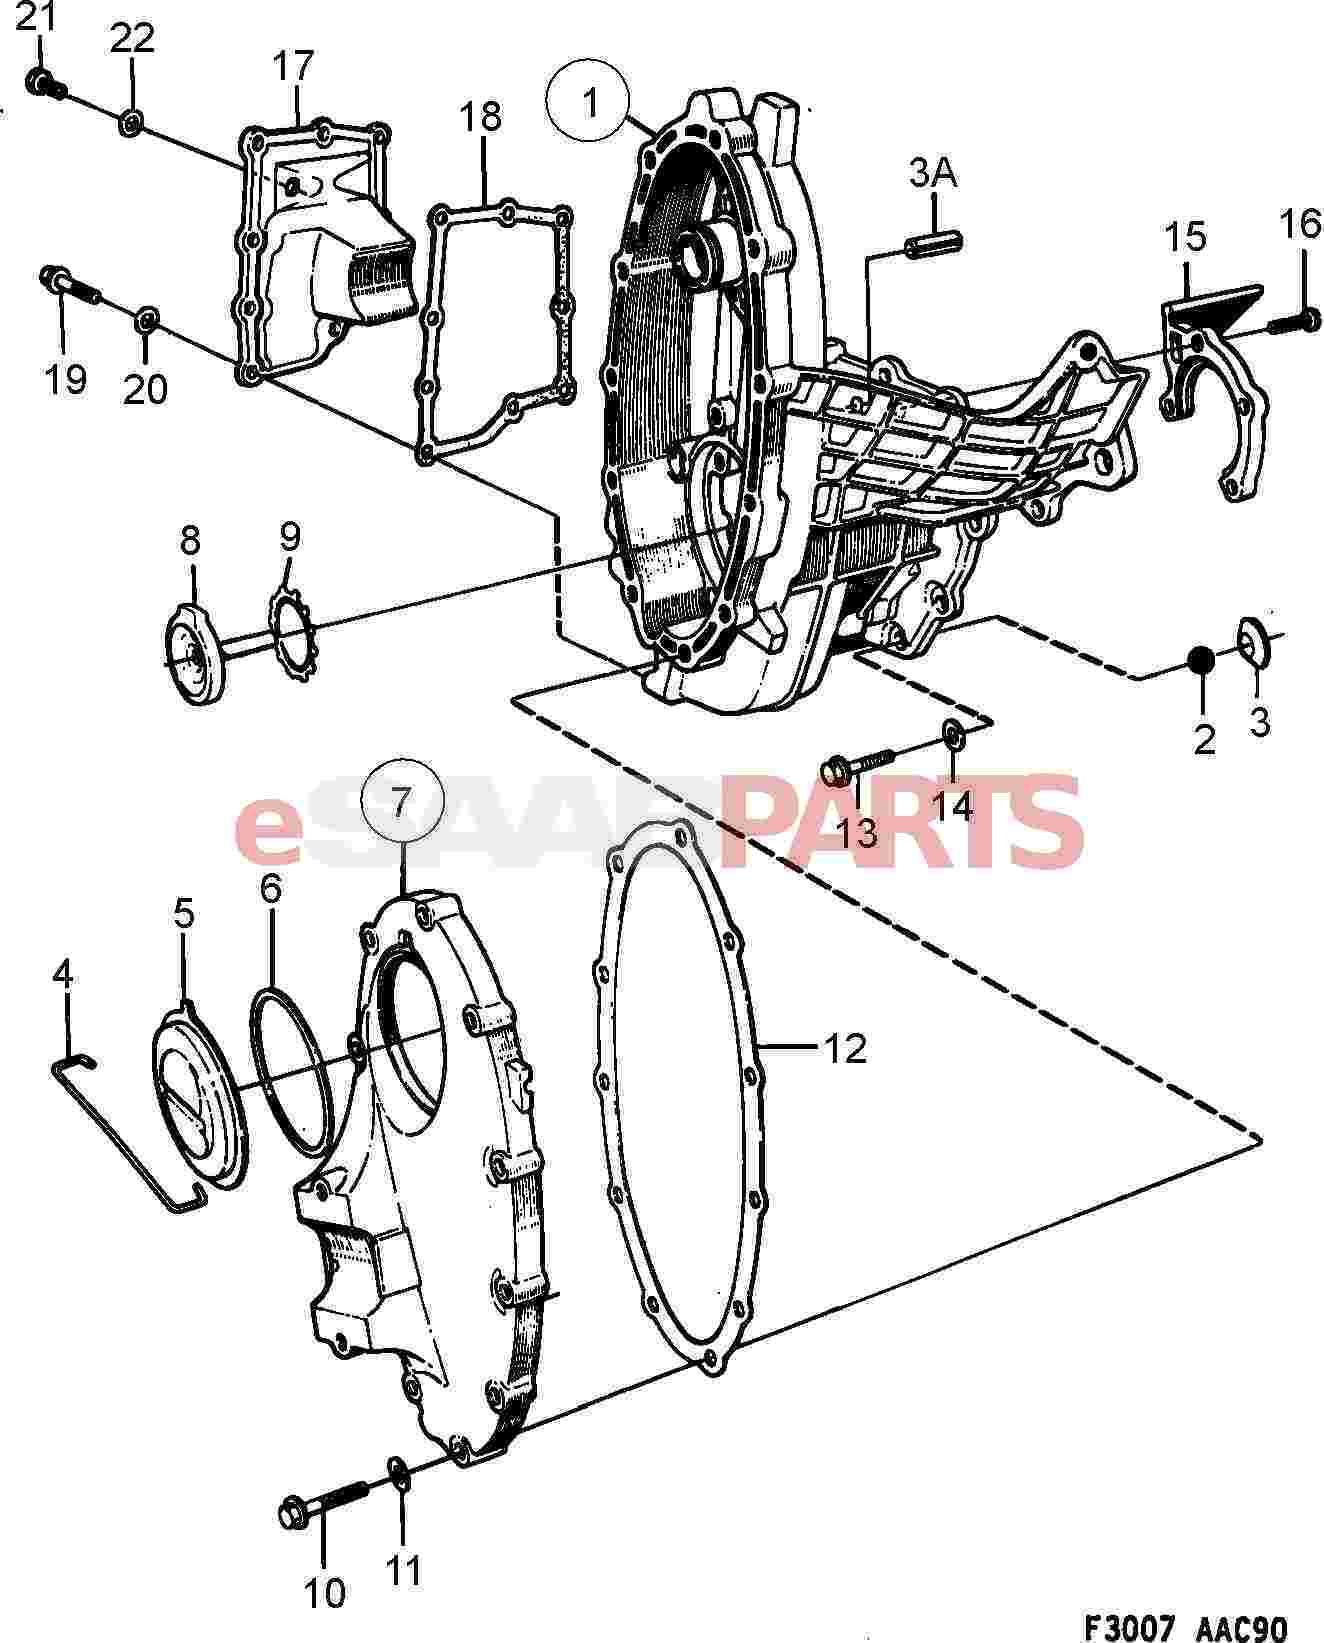 Saab 900 Transmission Parts Manual Bicycle Brake Diagram Primary Gear Case